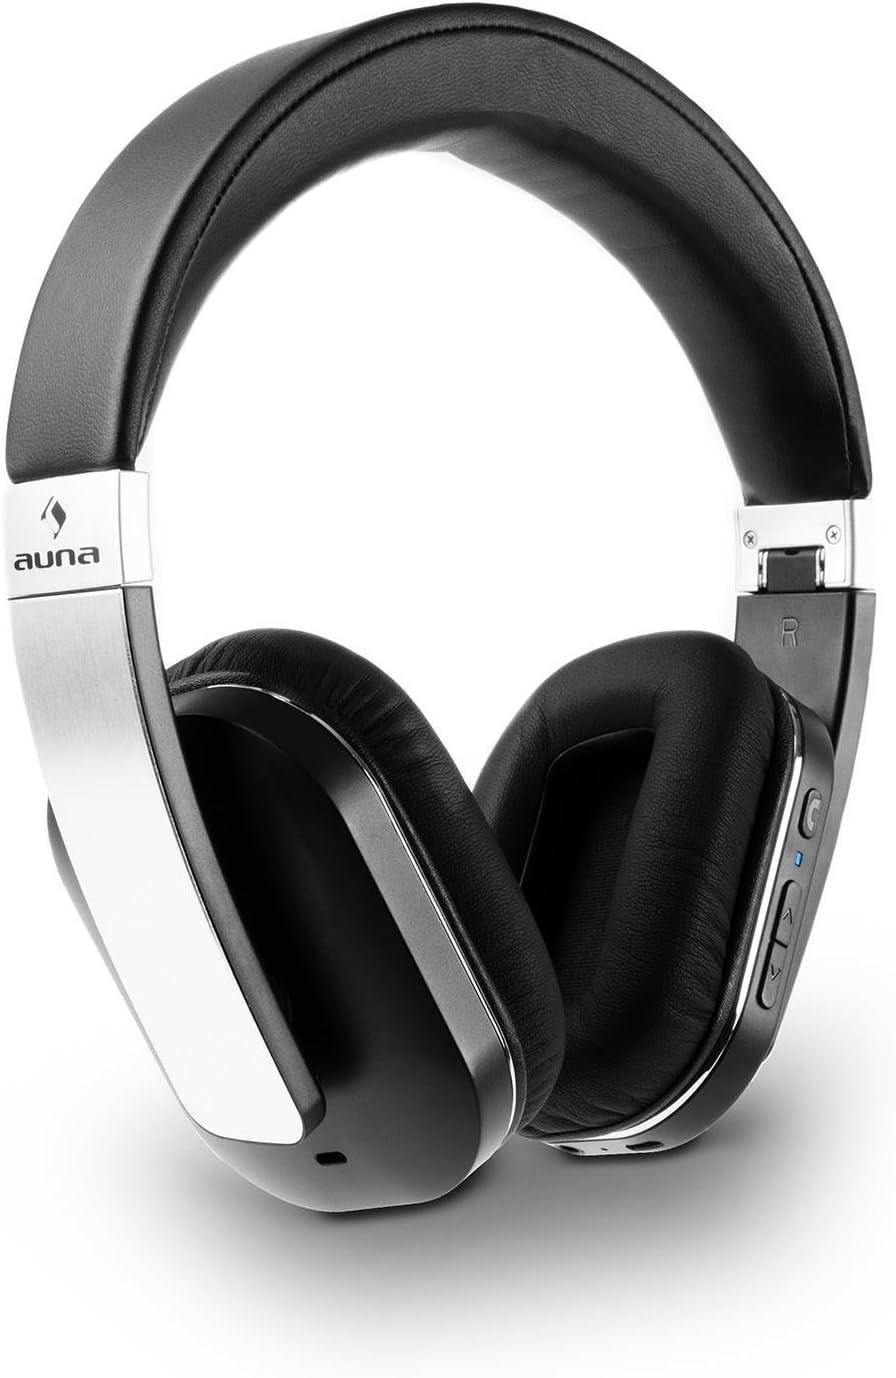 AUNA Elegance Auriculares Bluetooth - Cascos, Auriculares inalámbricos, Bluetooth 4.0, AptX, Headset, Manos Libres, NFC, Batería Iones de Litio, Autonomía 14h, Negro